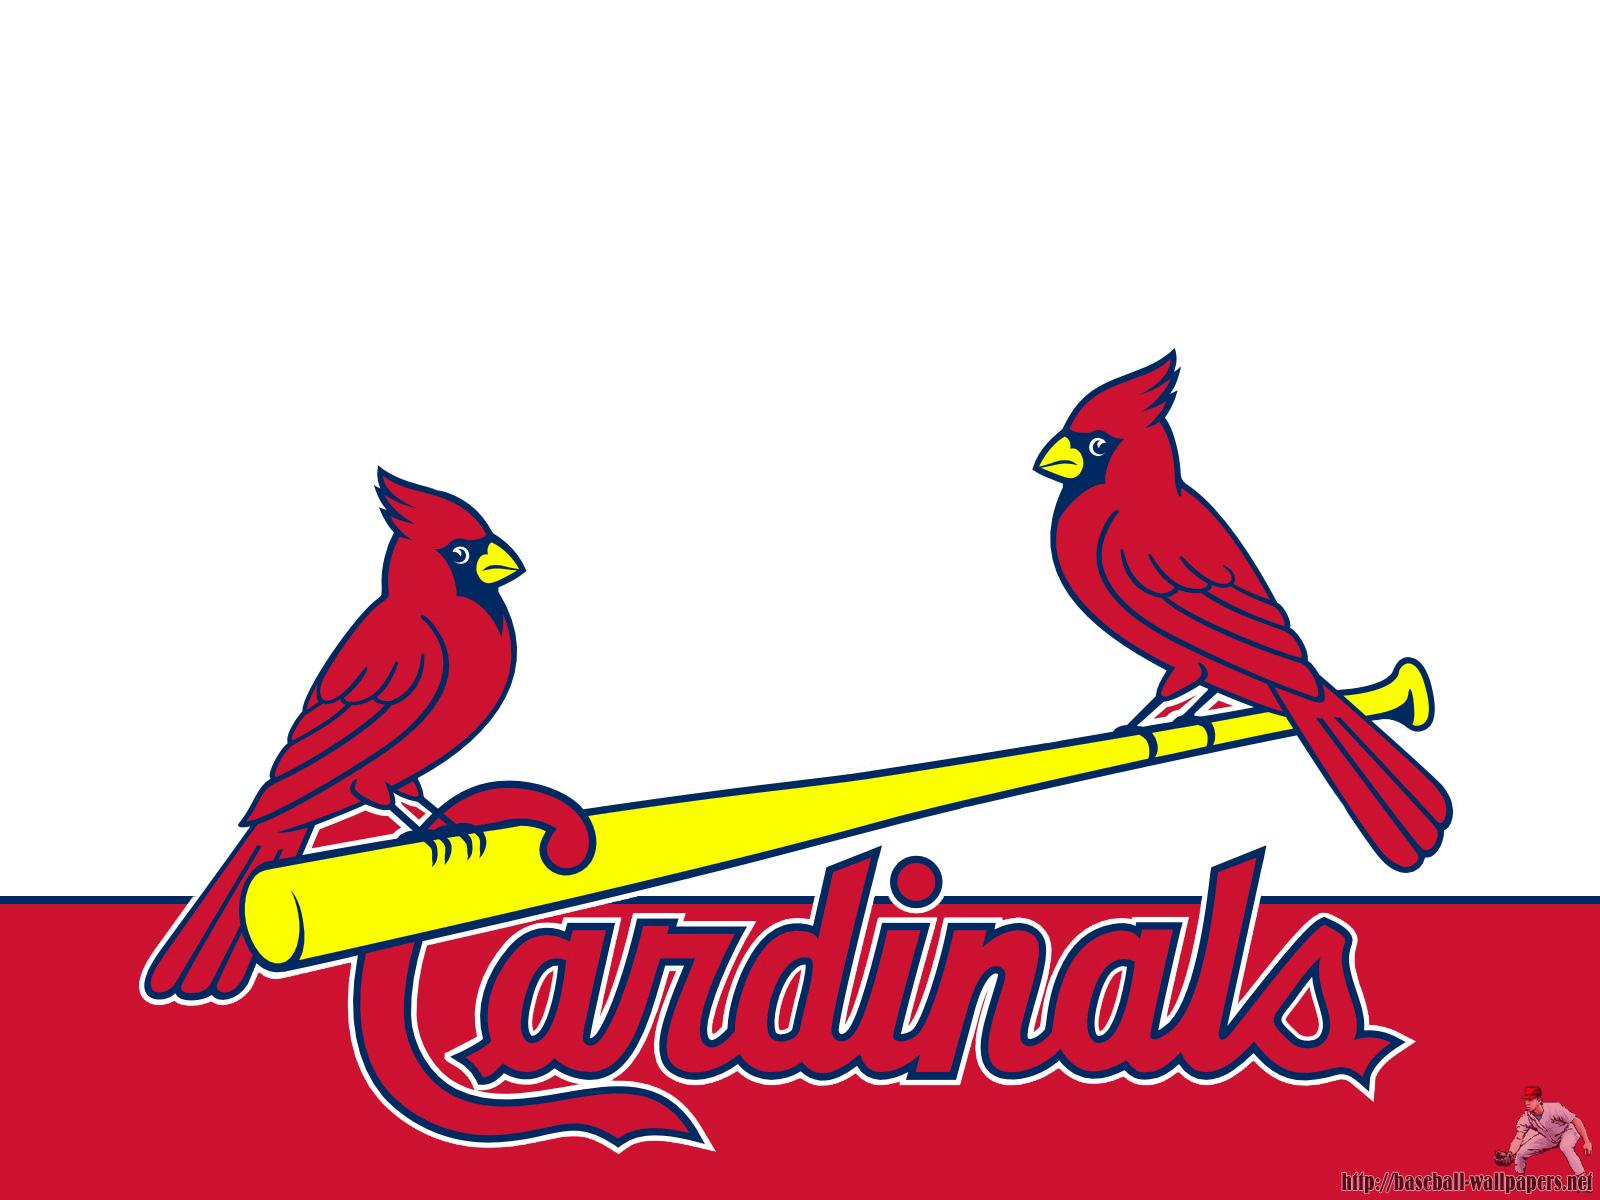 http://2.bp.blogspot.com/_ILX0fXv8gyE/TBeUYzhhDZI/AAAAAAAAB-k/B0xoT9oAiiw/s1600/st_louis_cardinals_logo_wallpaper.jpg